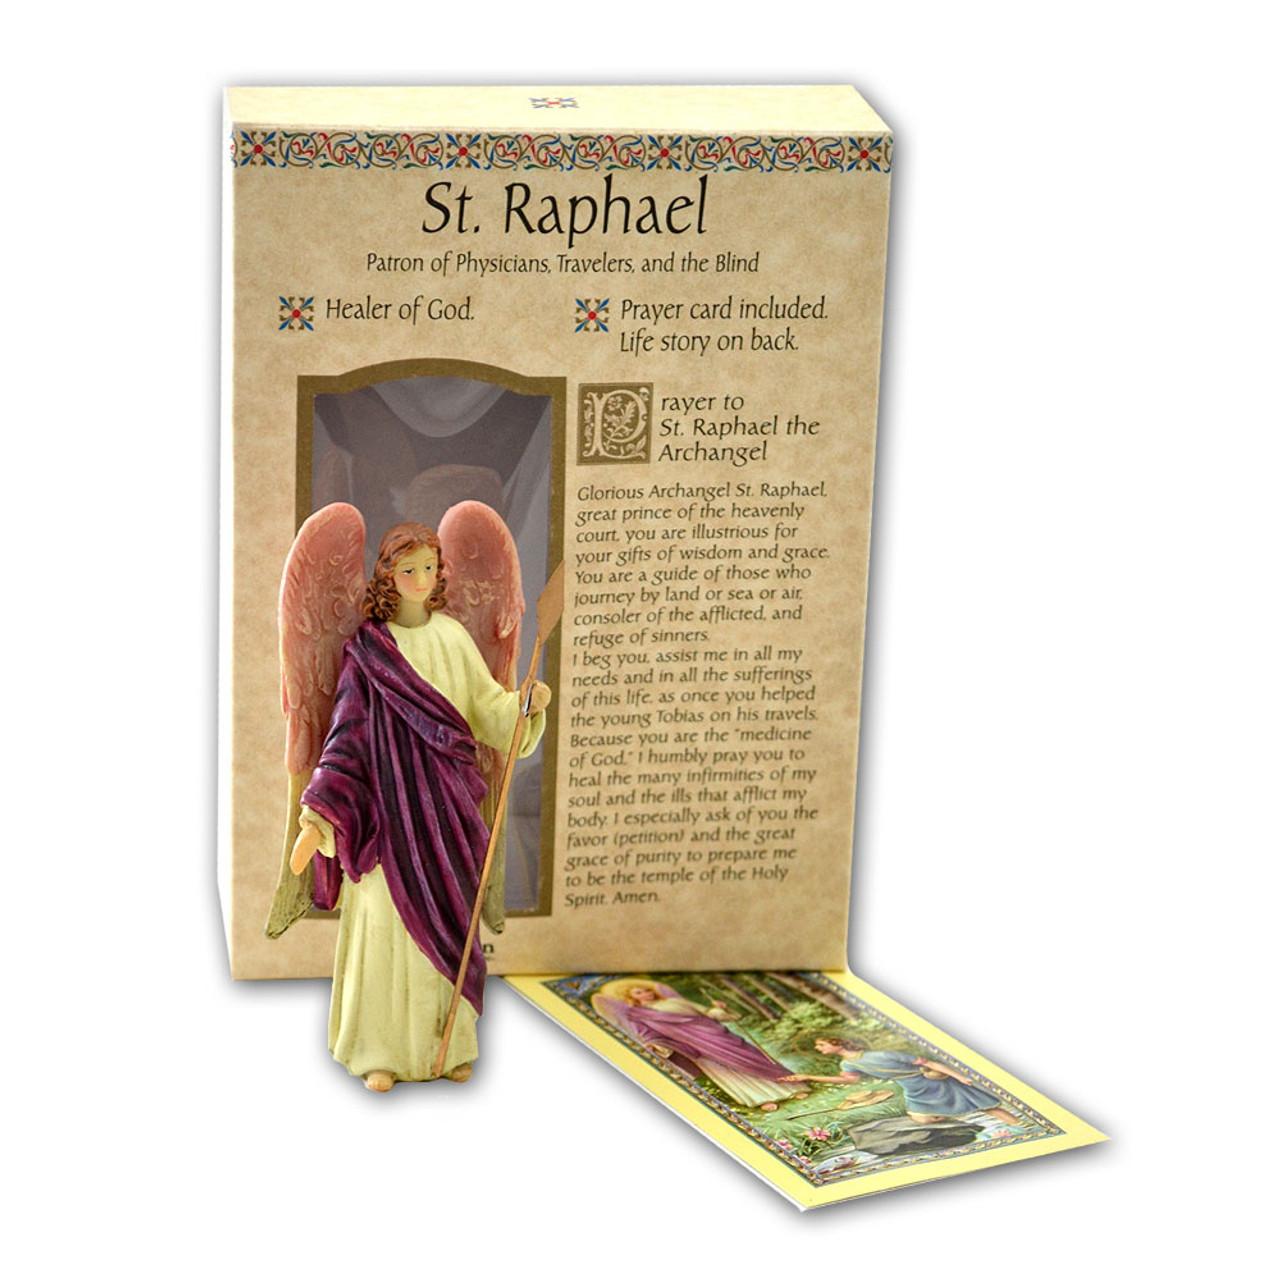 St Raphael 4 Inch Resin Statue